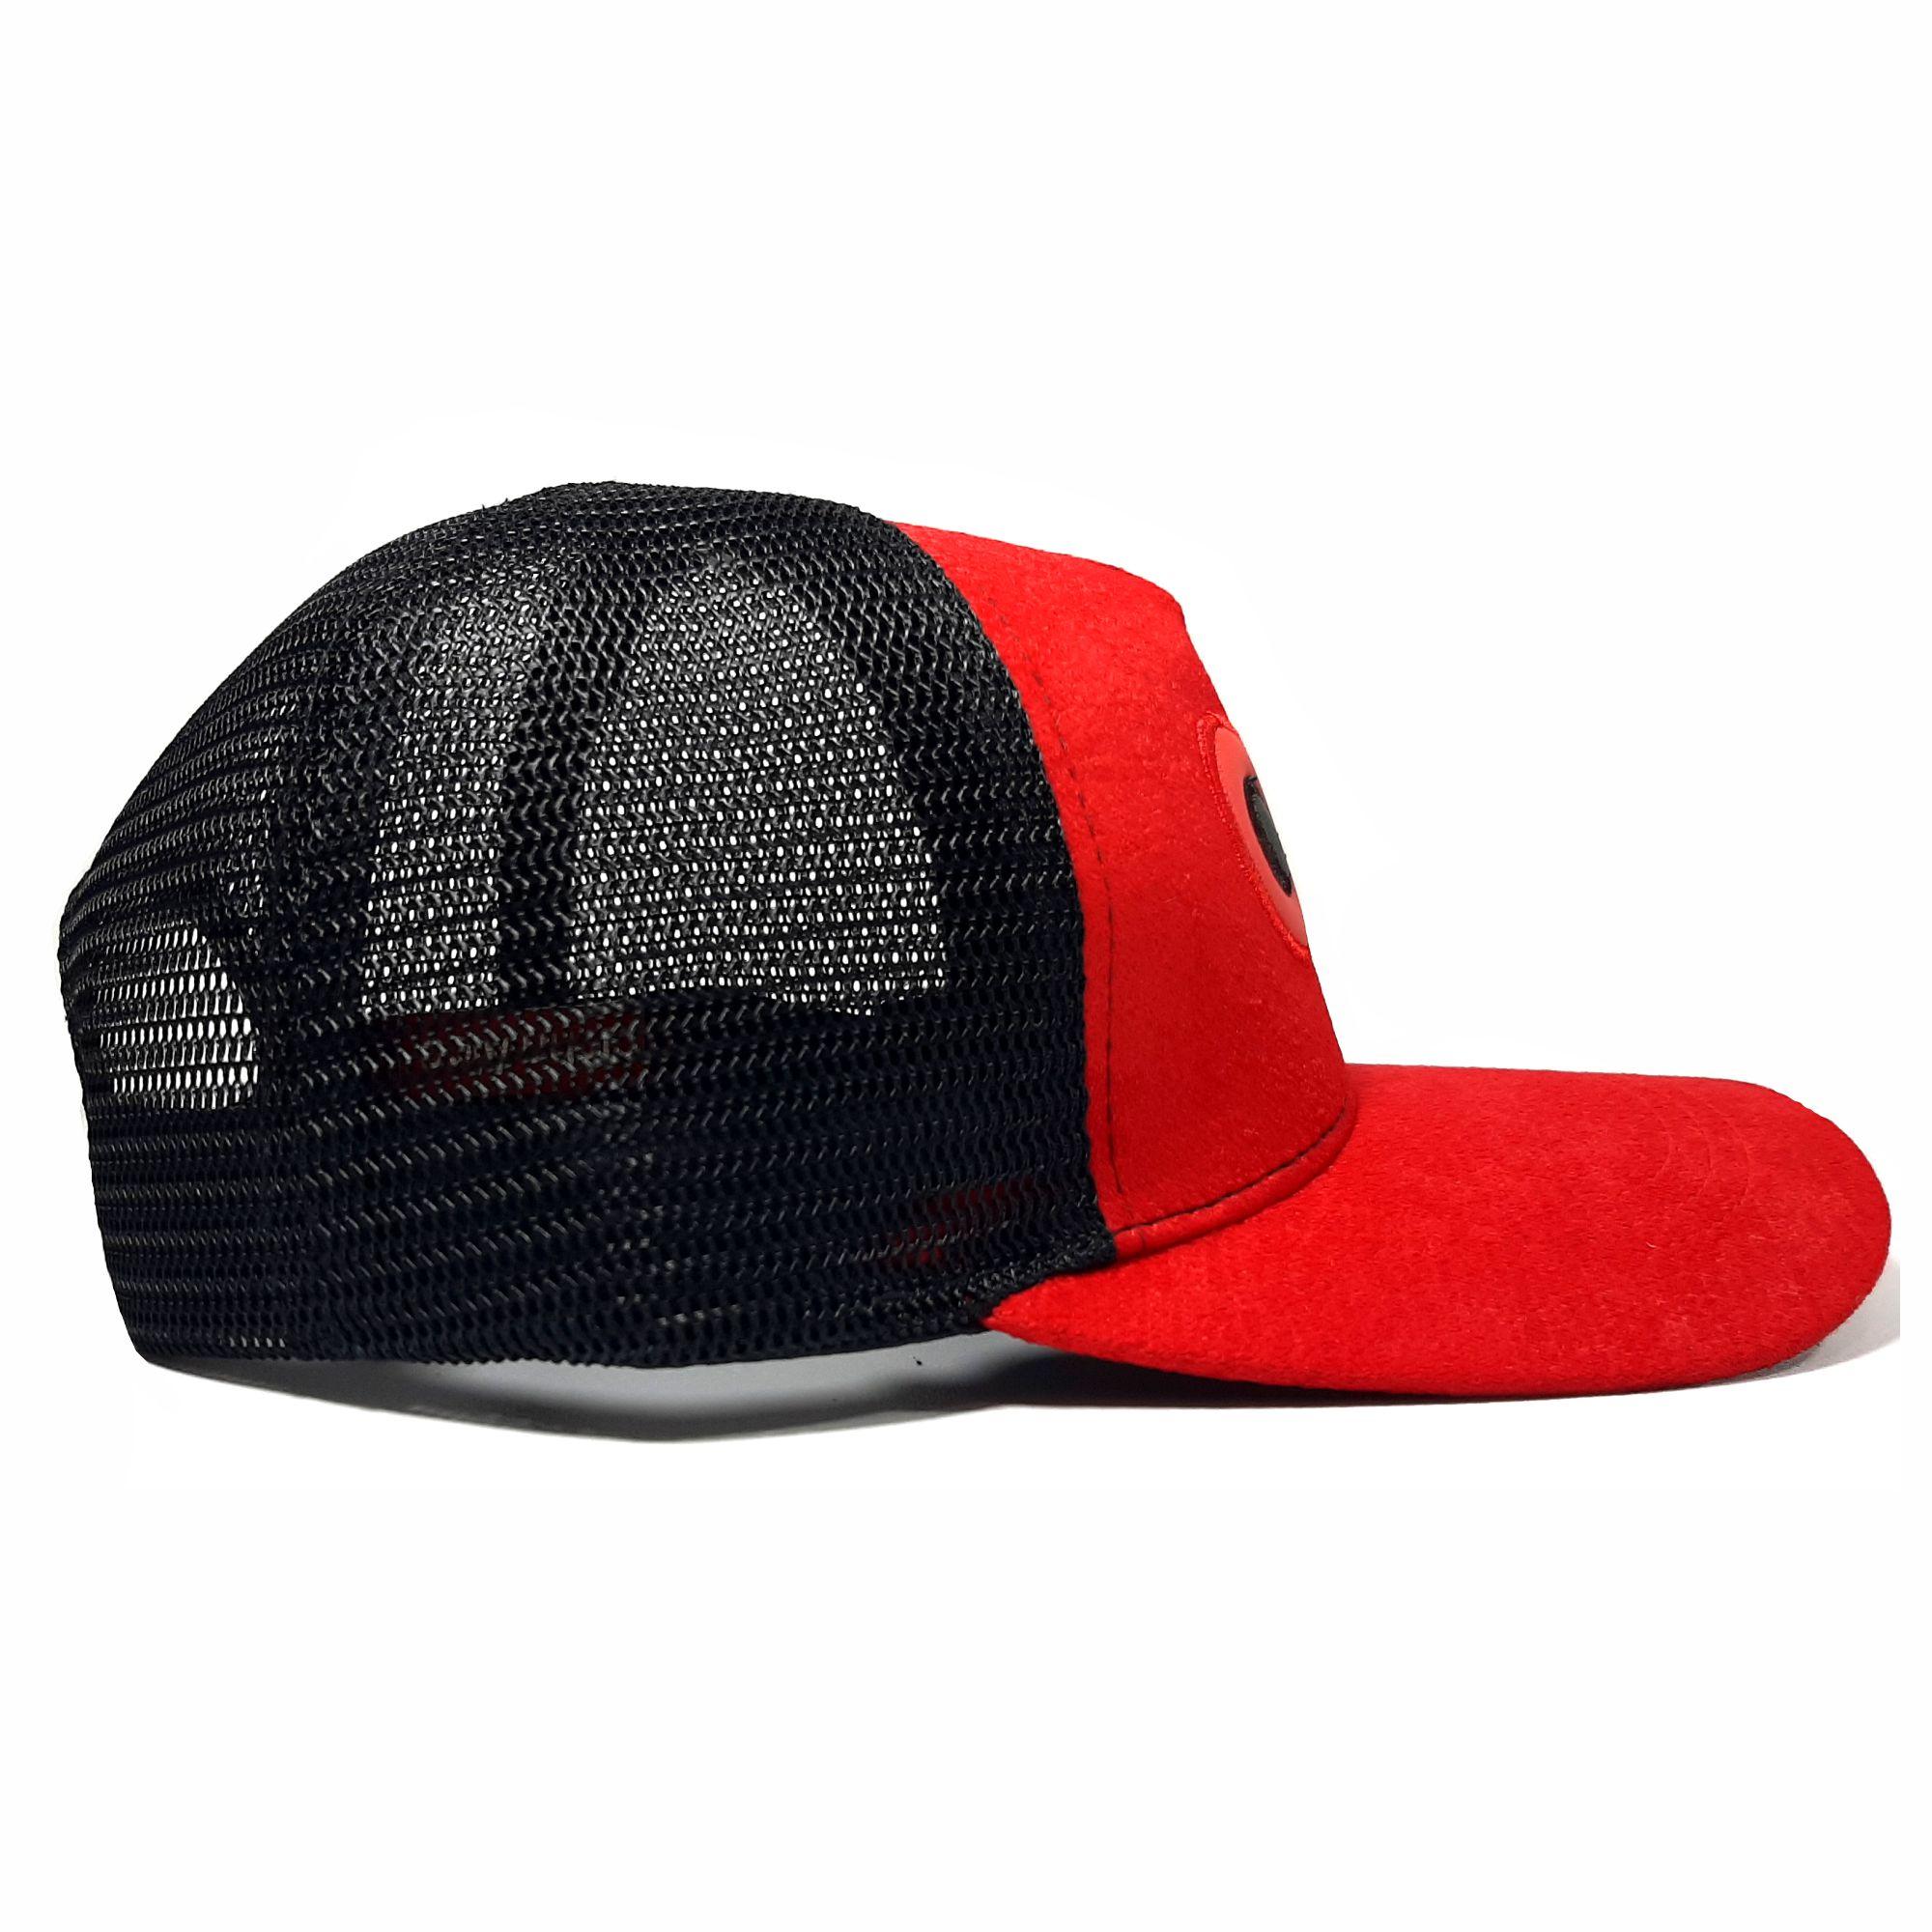 ref 1625 2 Gorra lona rojo visera rojo, con maya negra ojos bordados grandes $37.000 talla unica